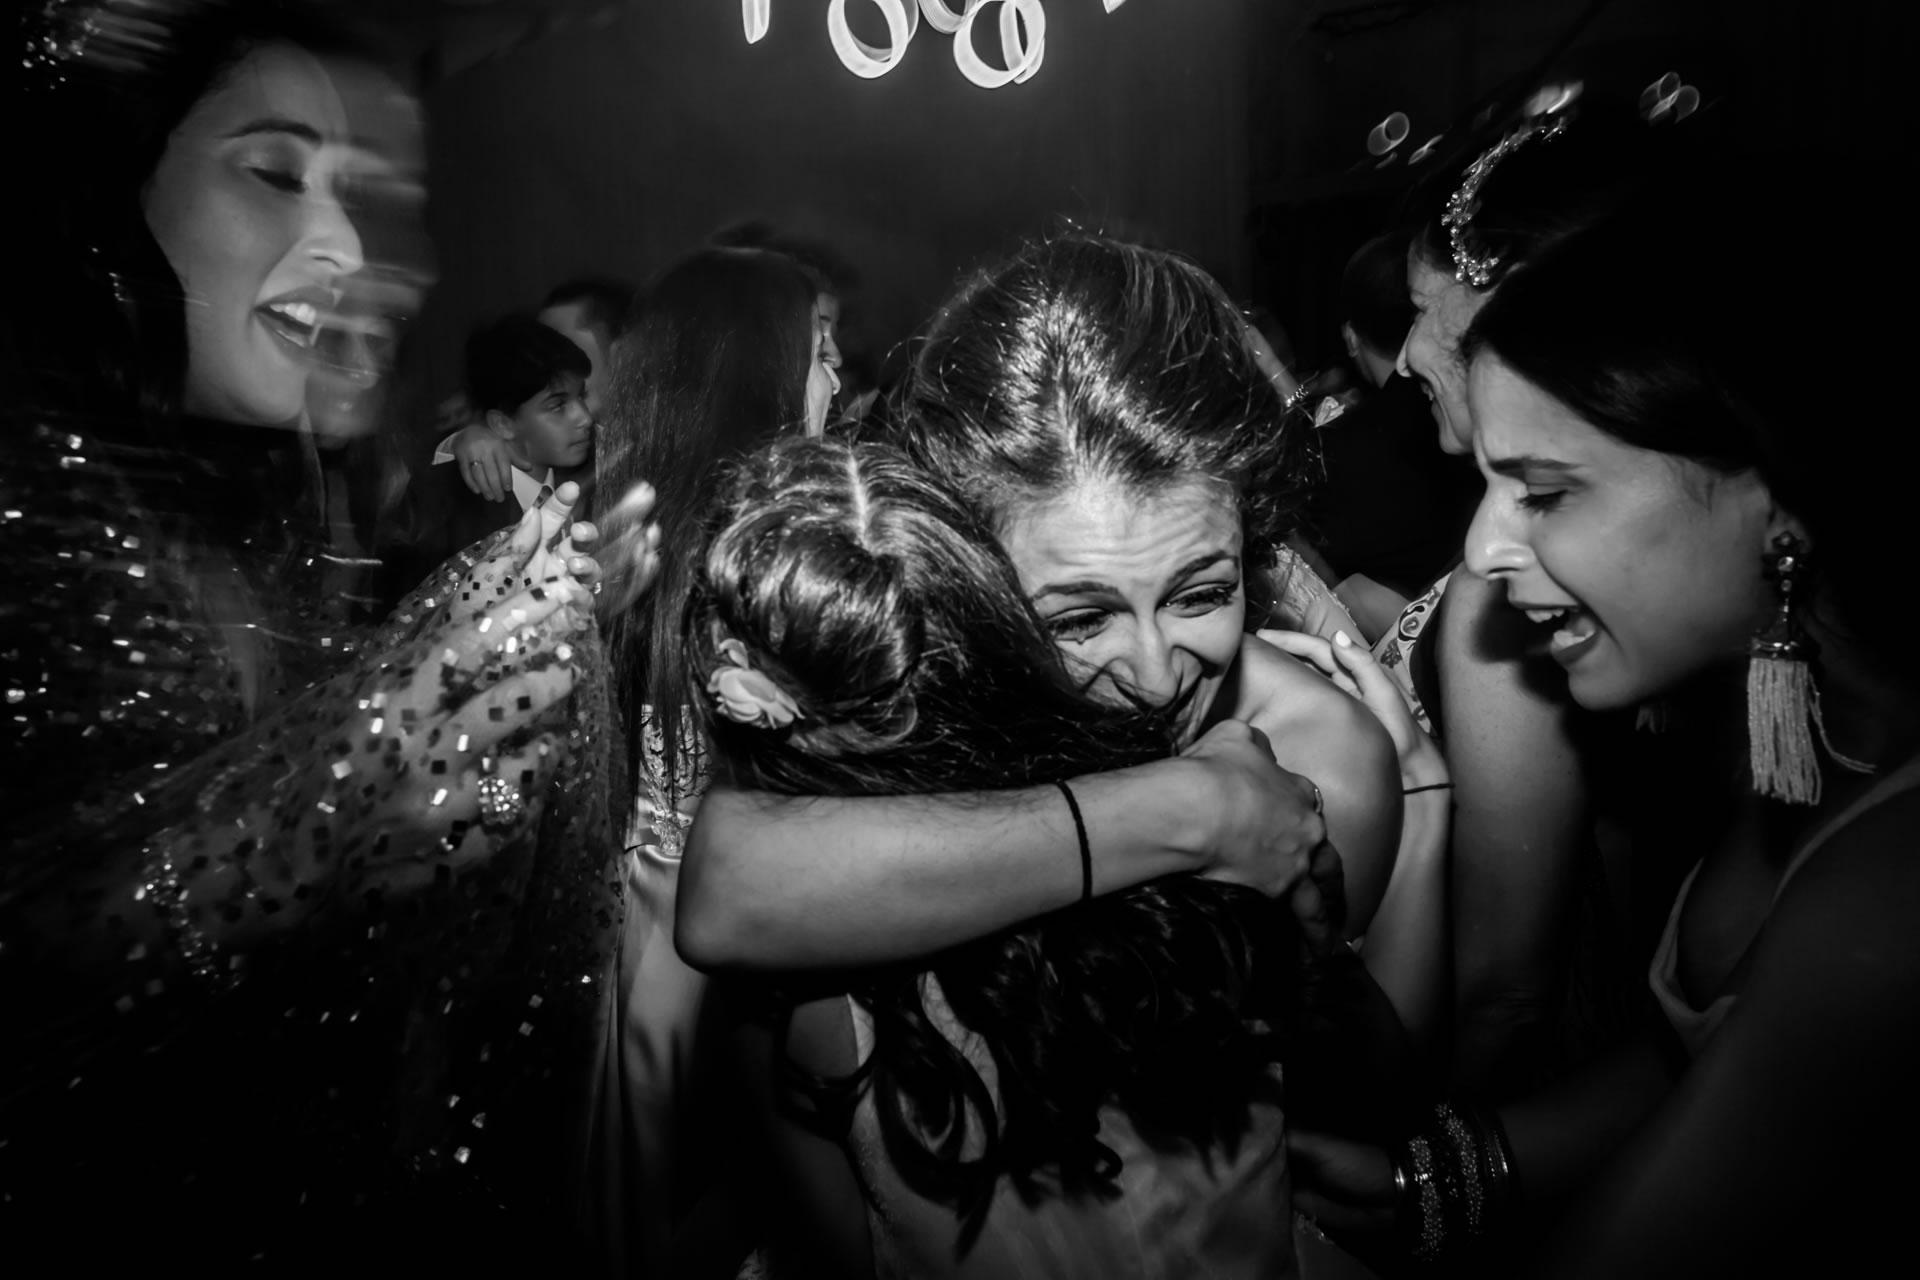 Cry - 91 :: Luxury wedding at Il Borro :: Luxury wedding photography - 90 :: Cry - 91